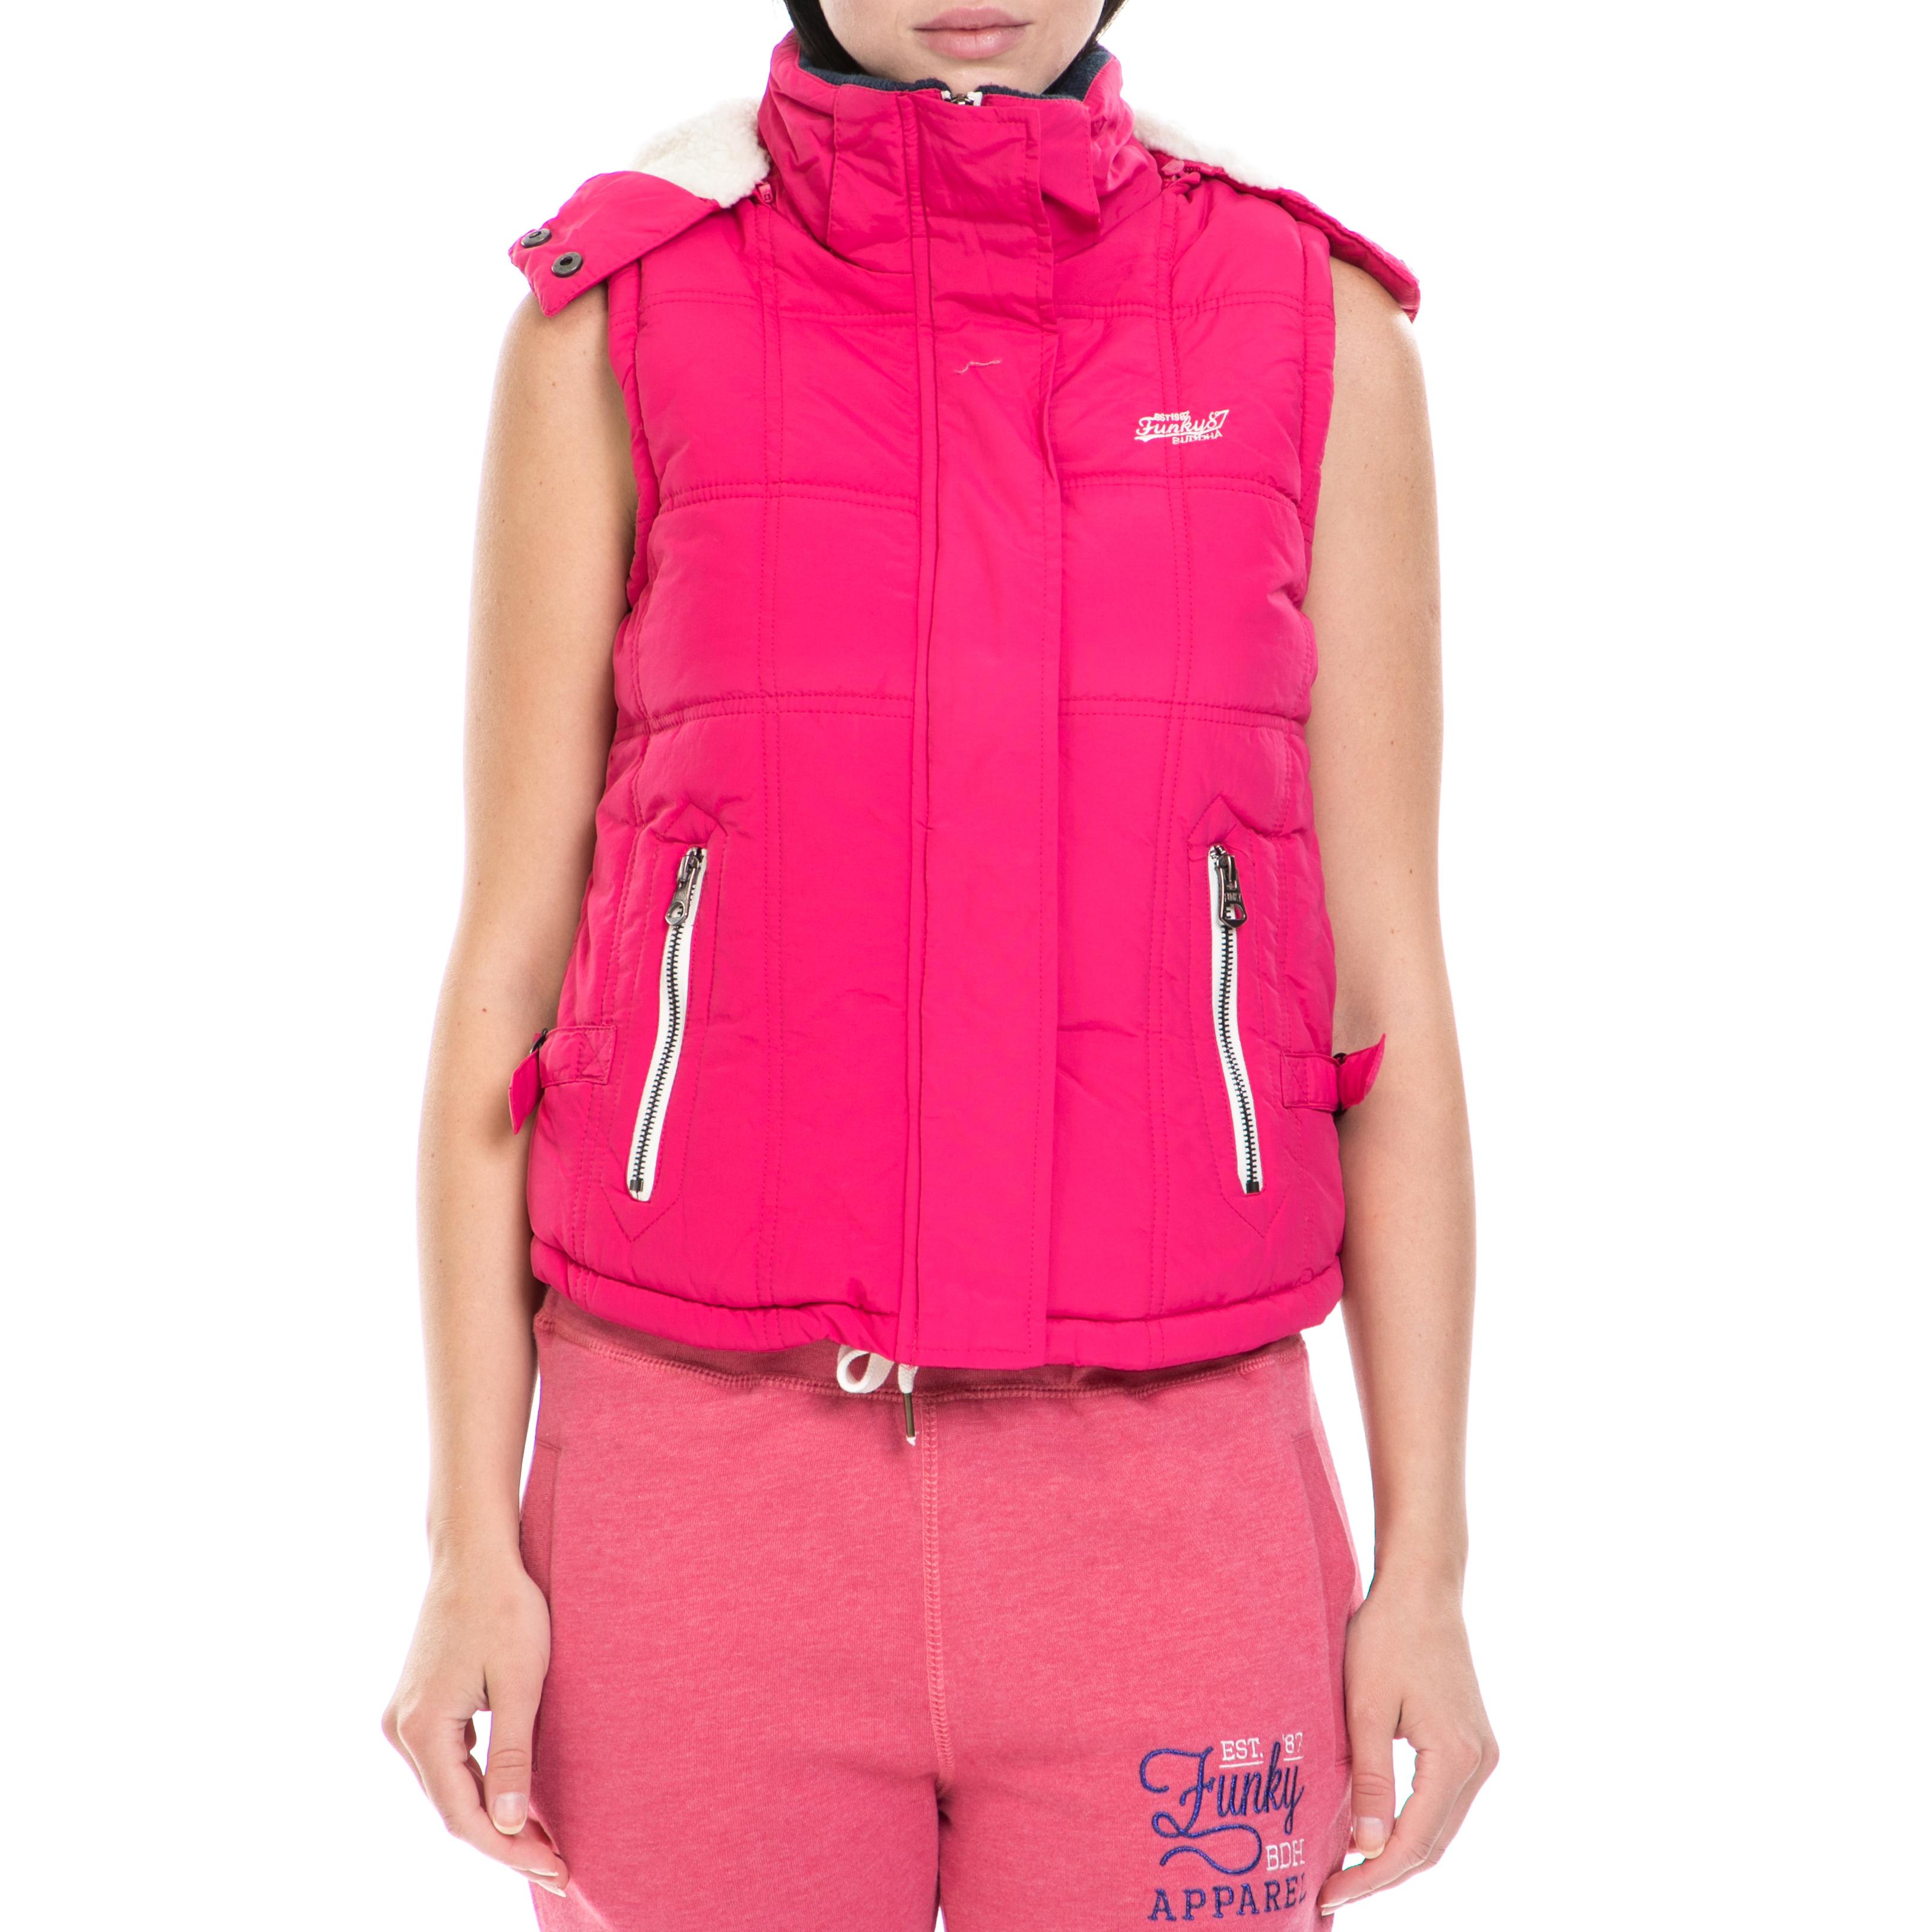 32b1cee41dc2 FUNKY BUDDHA – Γυναικείο αμάνικο μπουφάν FUNKY BUDDHA ροζ. Factory Outlet